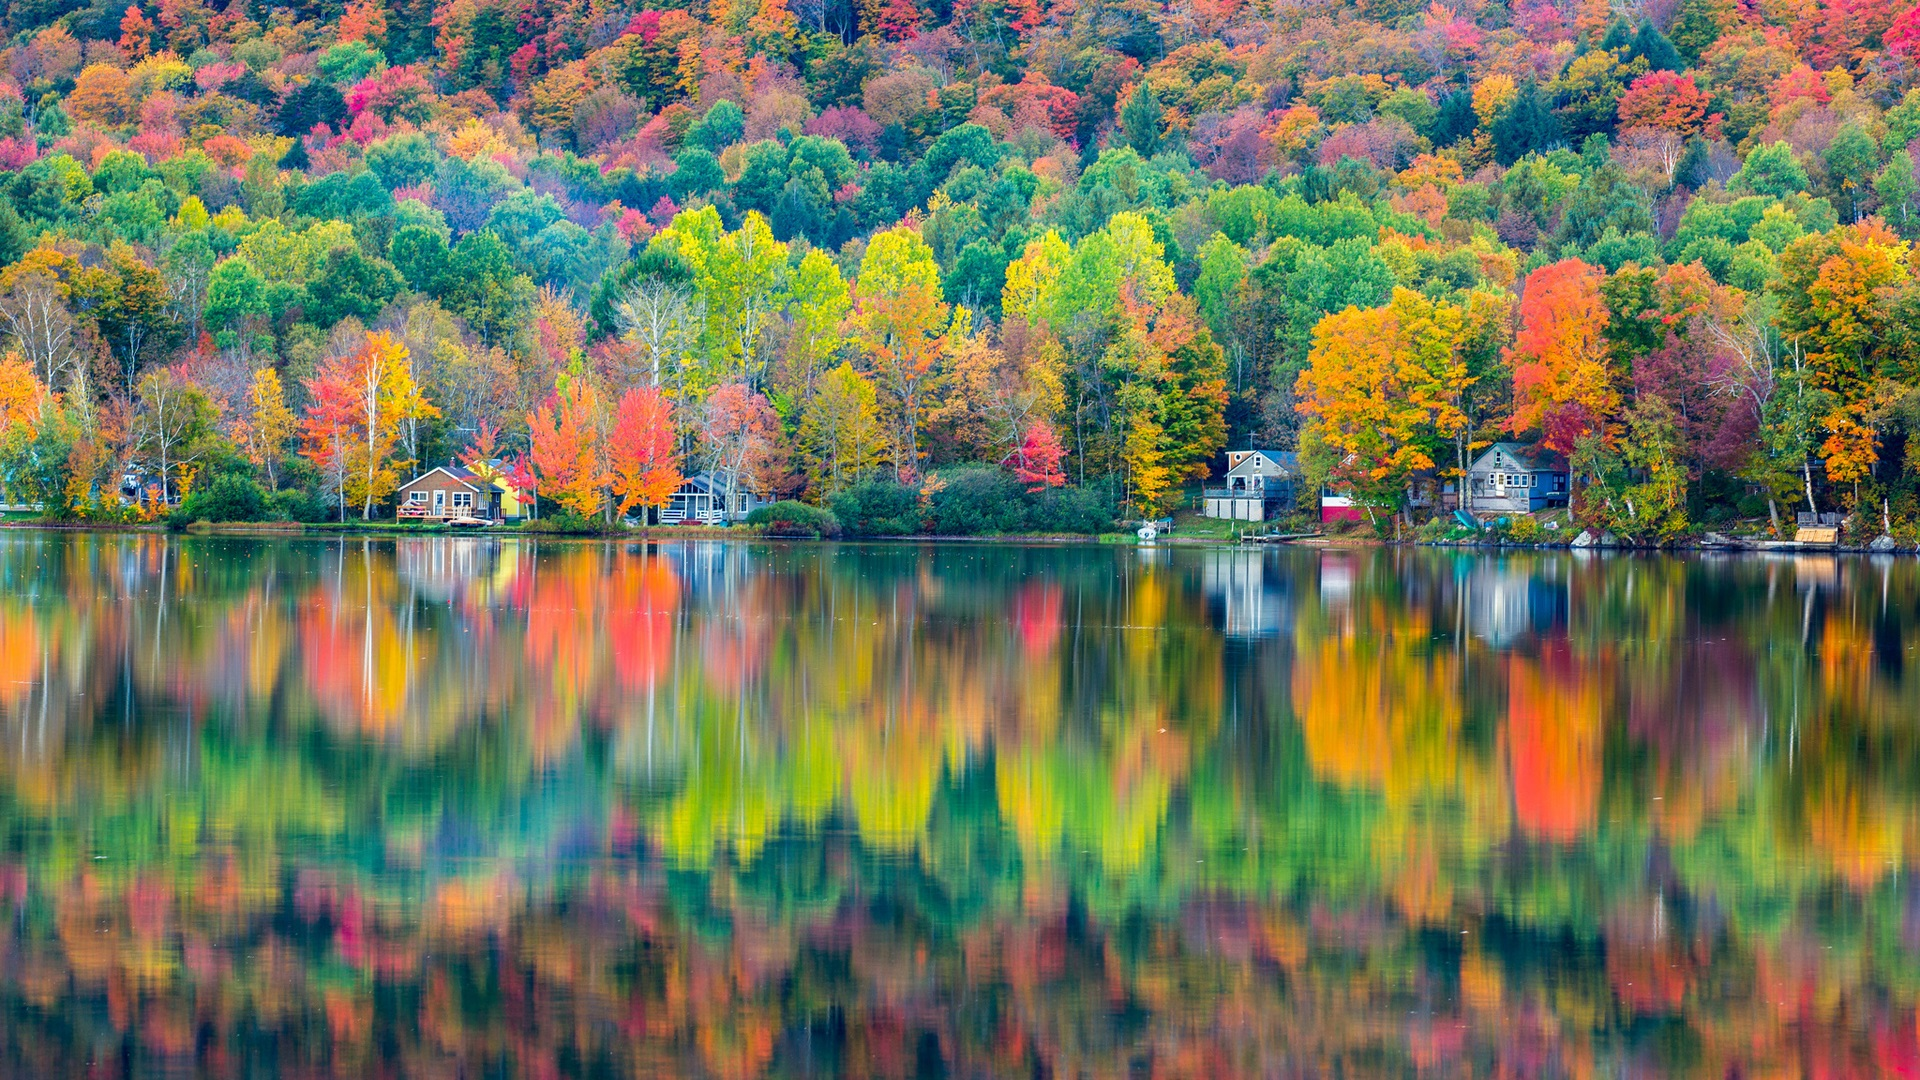 vermont in autumn hd wallpaper - photo #27